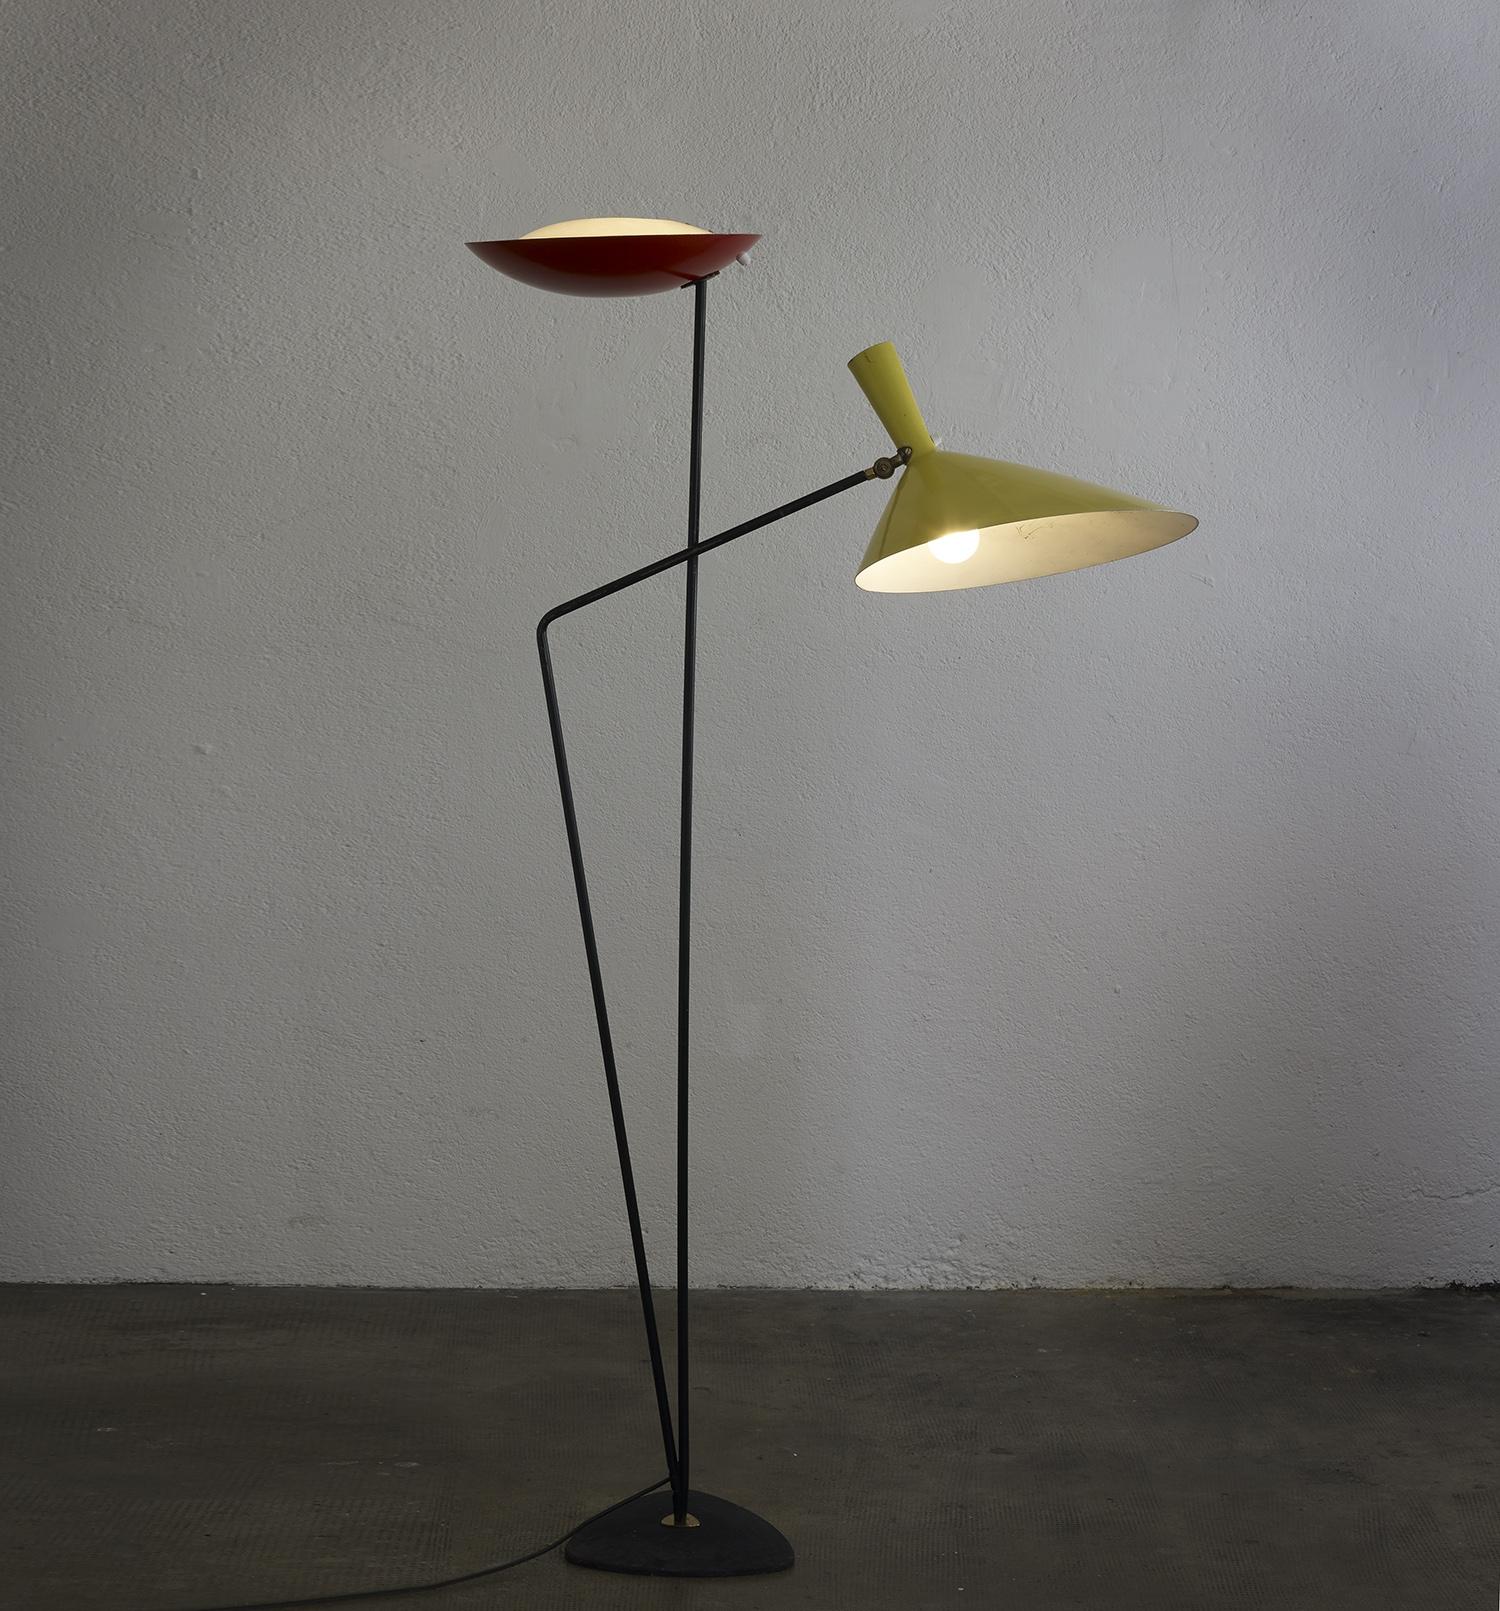 rare-lampe-de-sol-de-bag-turgi-1950-image-03